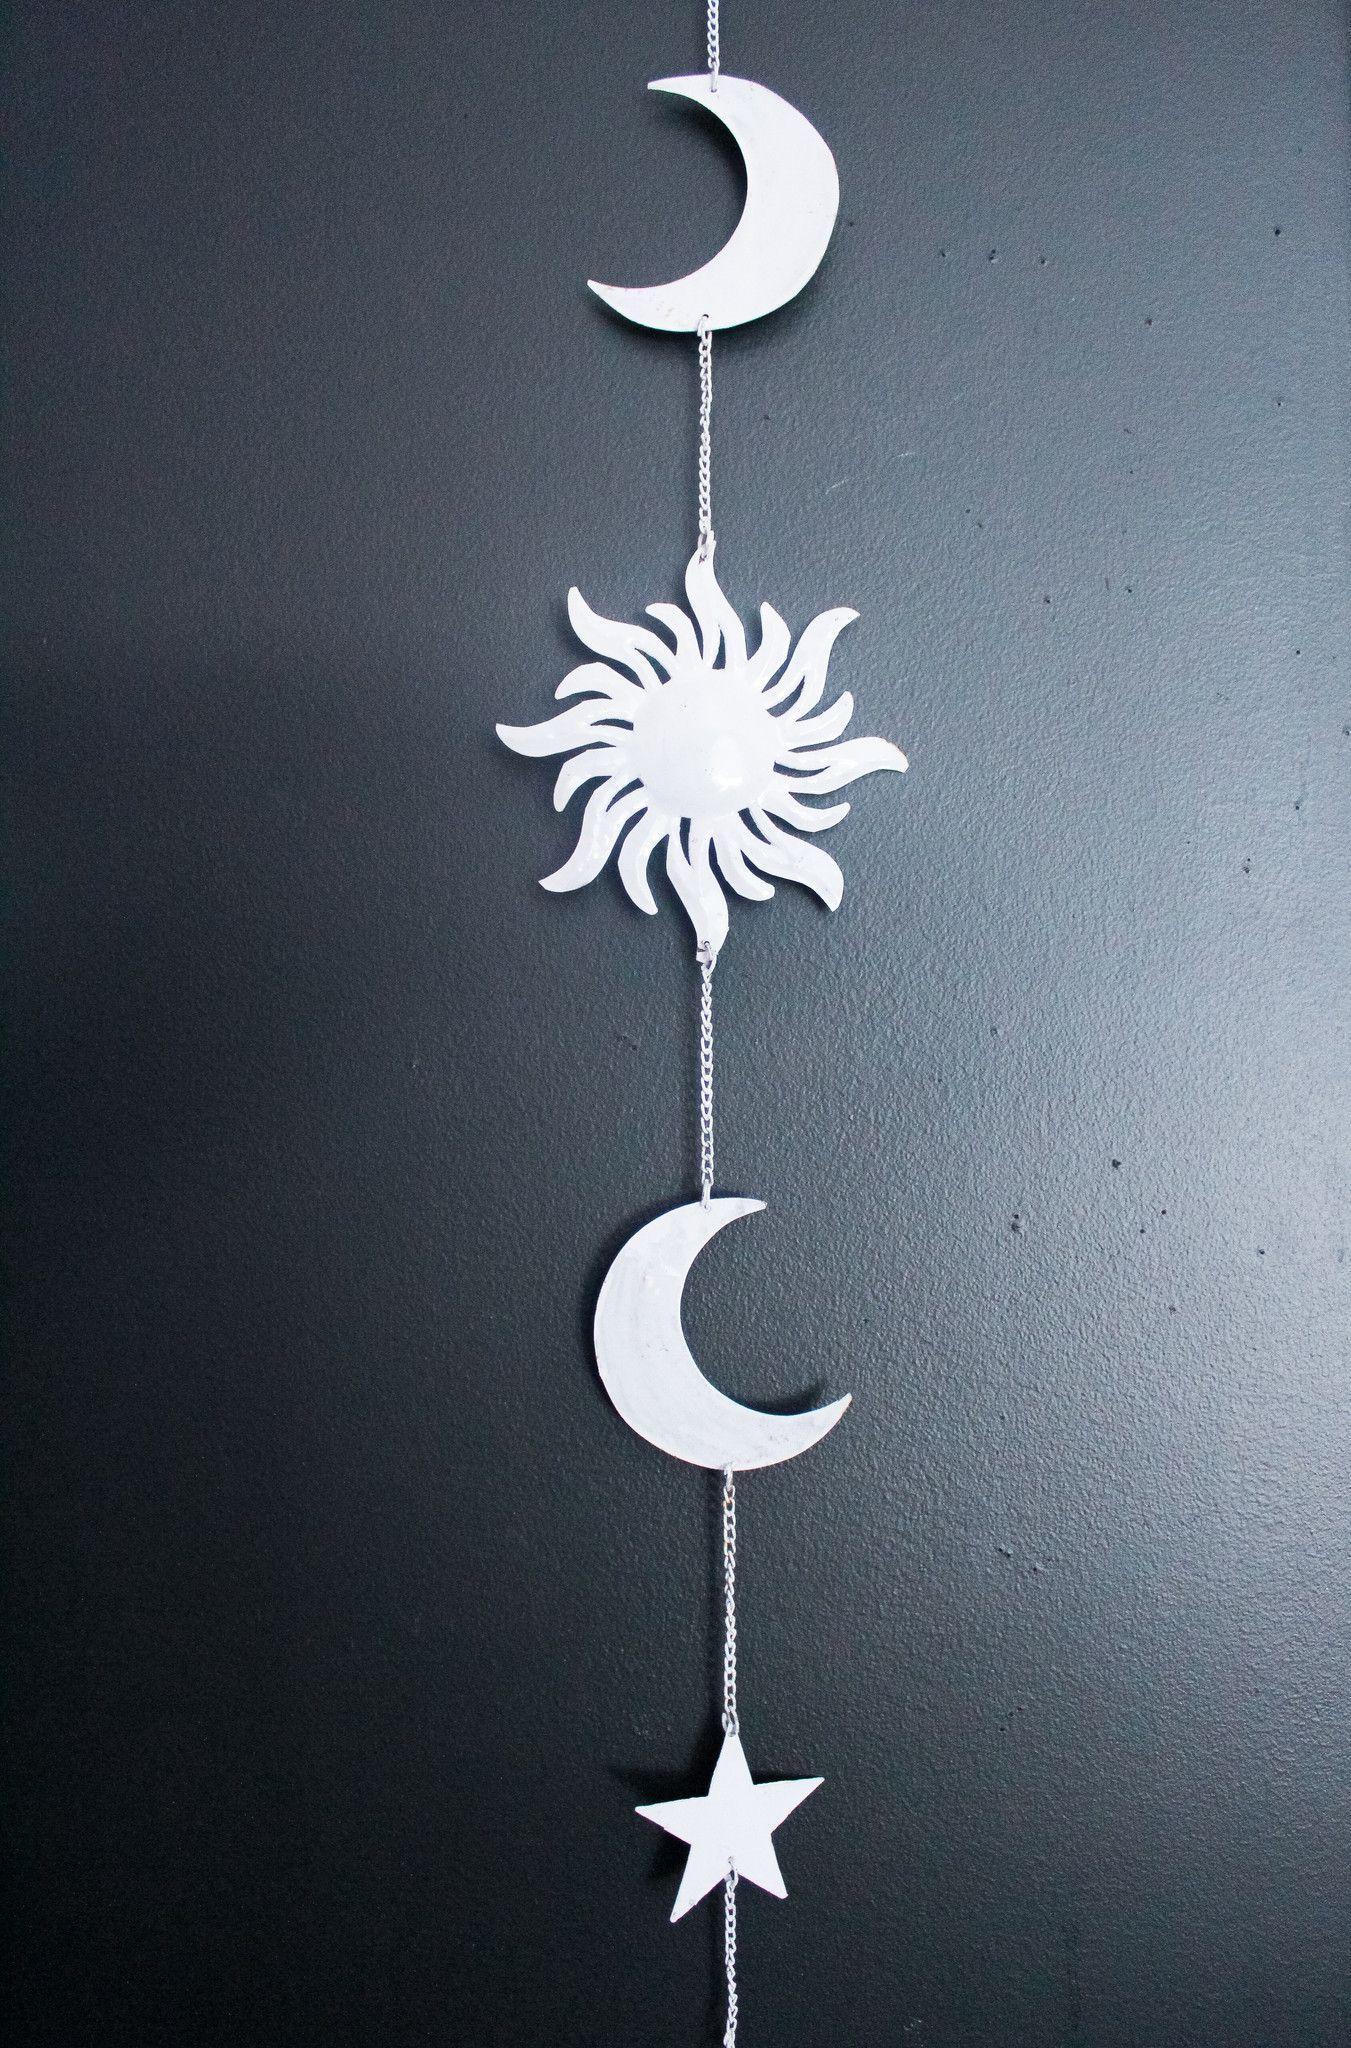 Celestial Wall Hanging Stars Wall Decor Sun Wall Decor Hanging Wall Decor